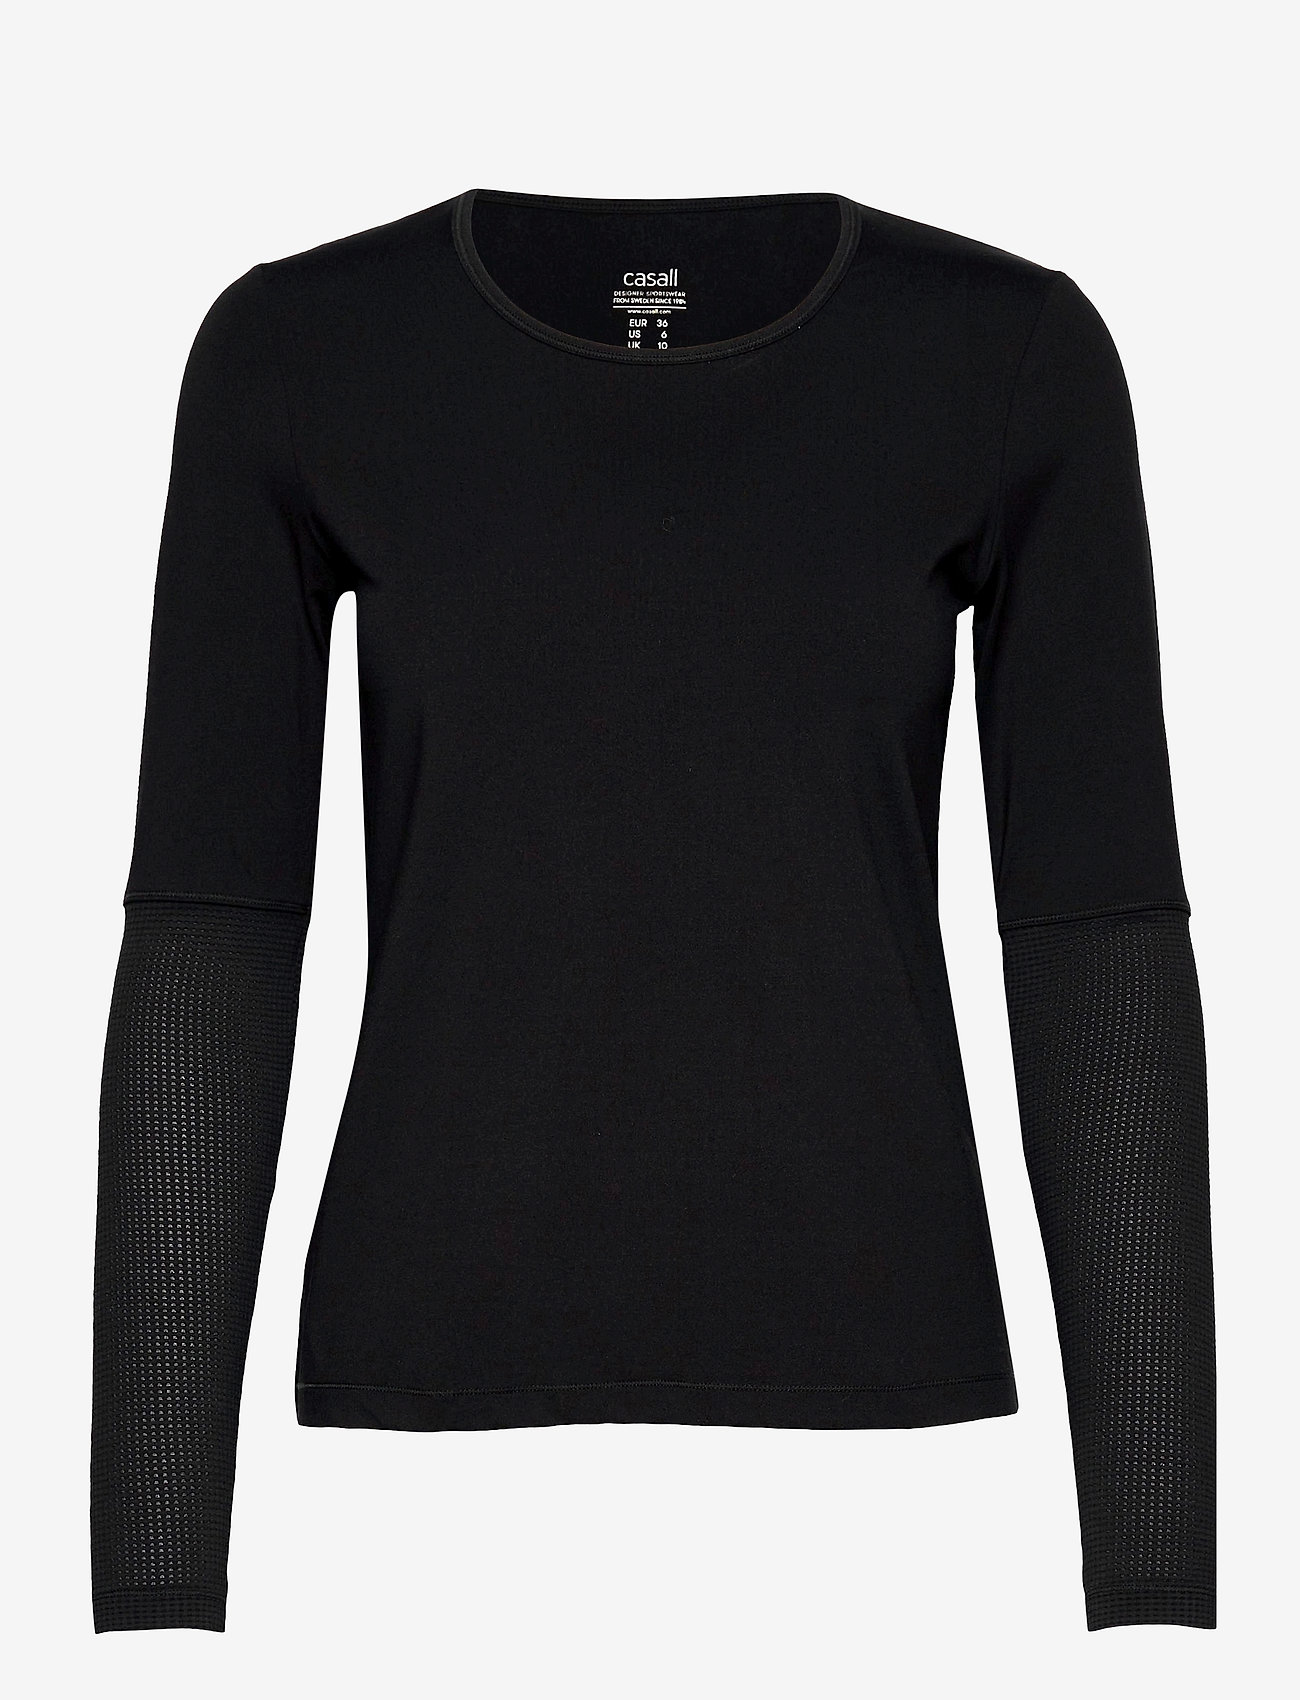 Casall - Iconic Long Sleeve - topjes met lange mouwen - black - 0